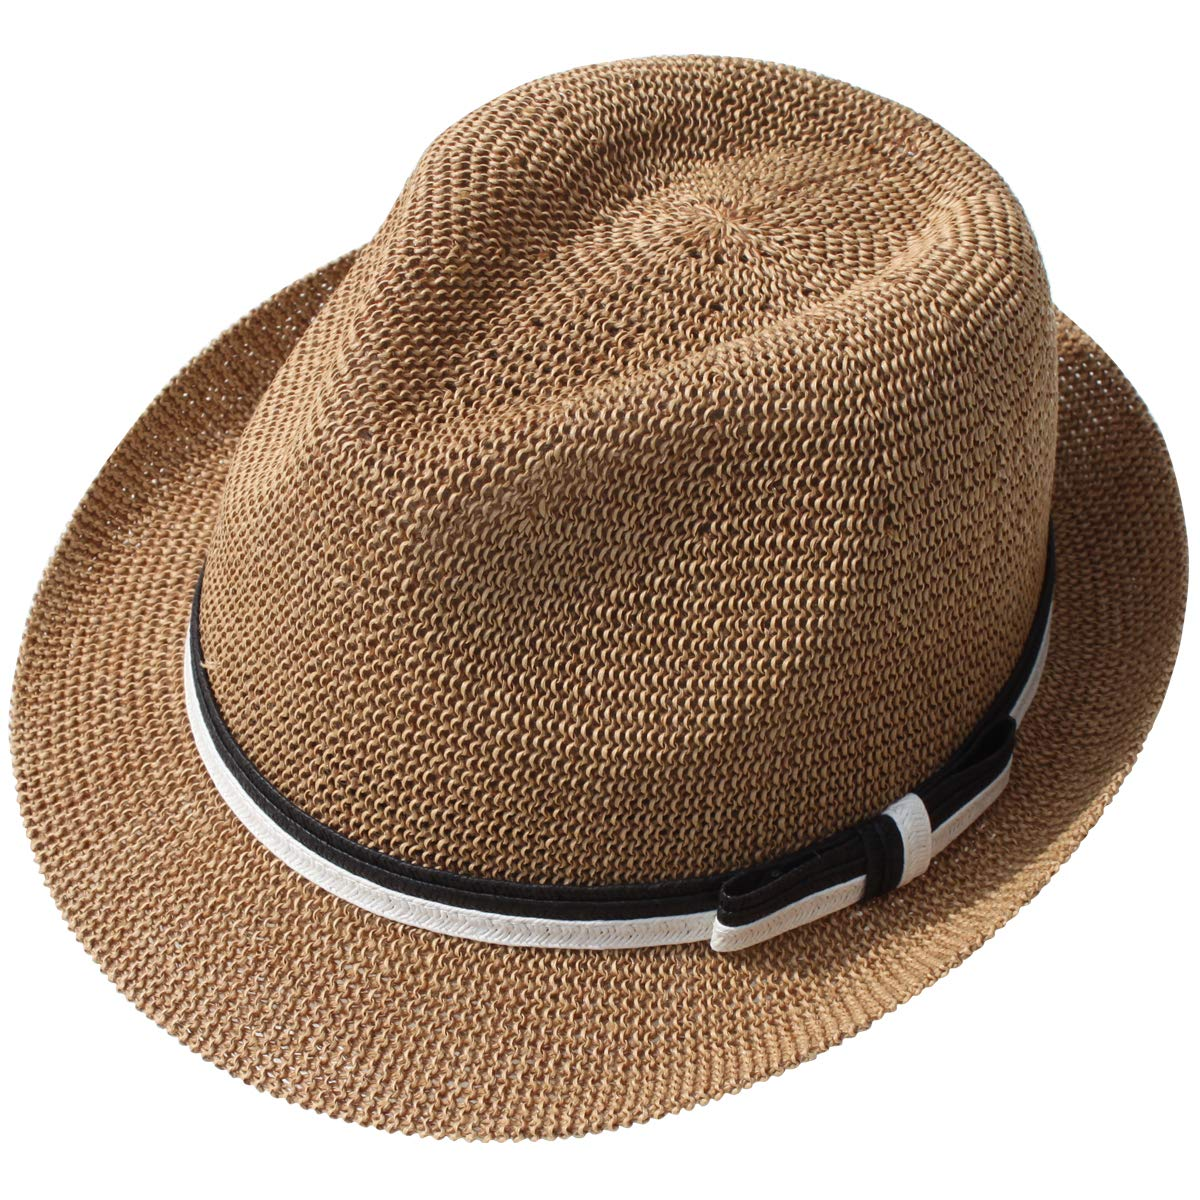 Lanzom Men Summer Breathable Fedora Hat Short Brim Beach Sun Hat